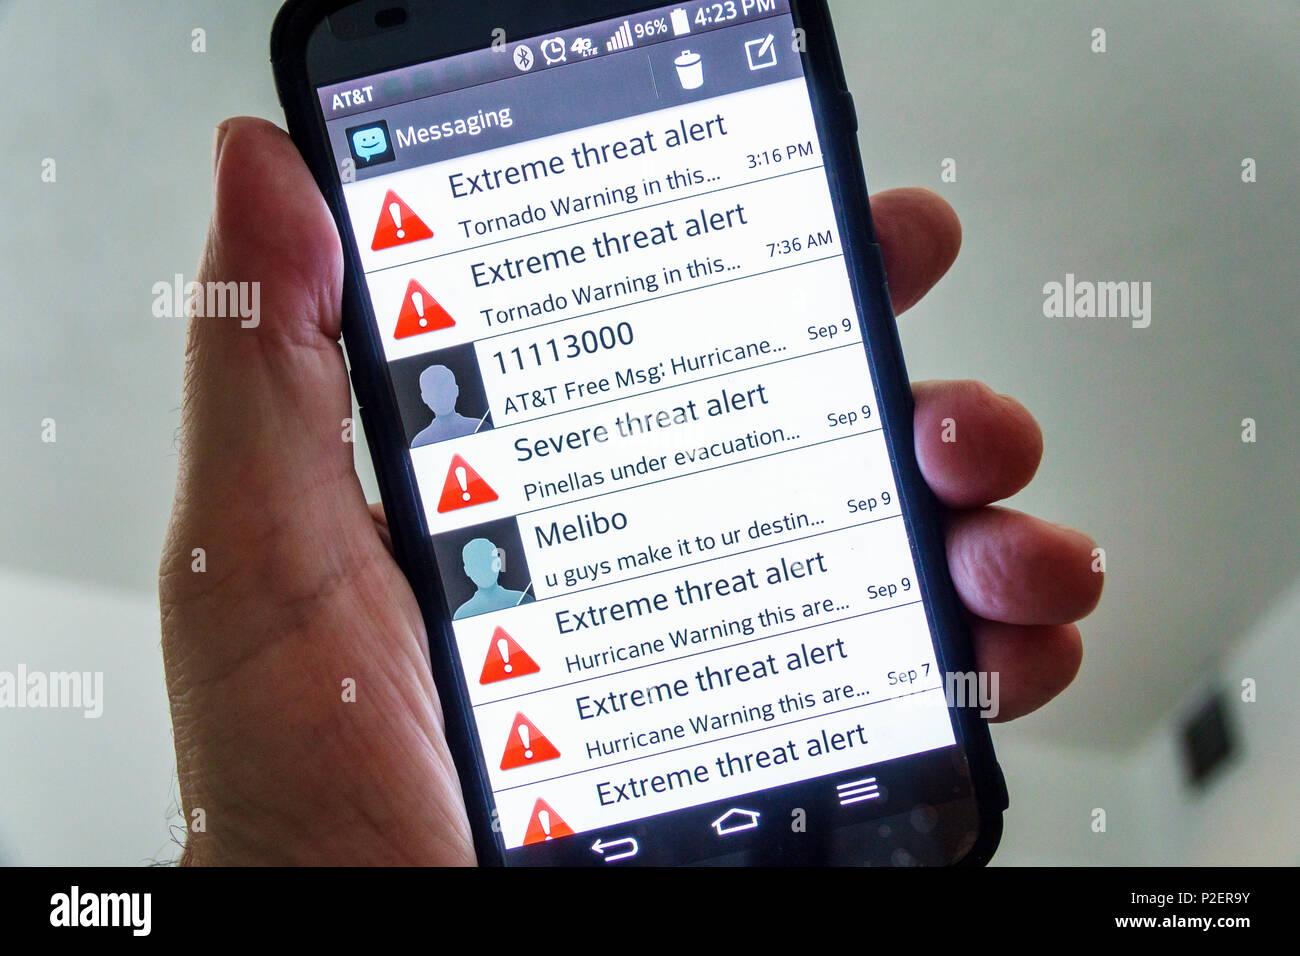 Florida Miami Beach smartphone Handy extreme Bedrohung alert Hurrikan Warnung Irma tornadowarnung sich AT&T kostenlosen Messaging Stockbild